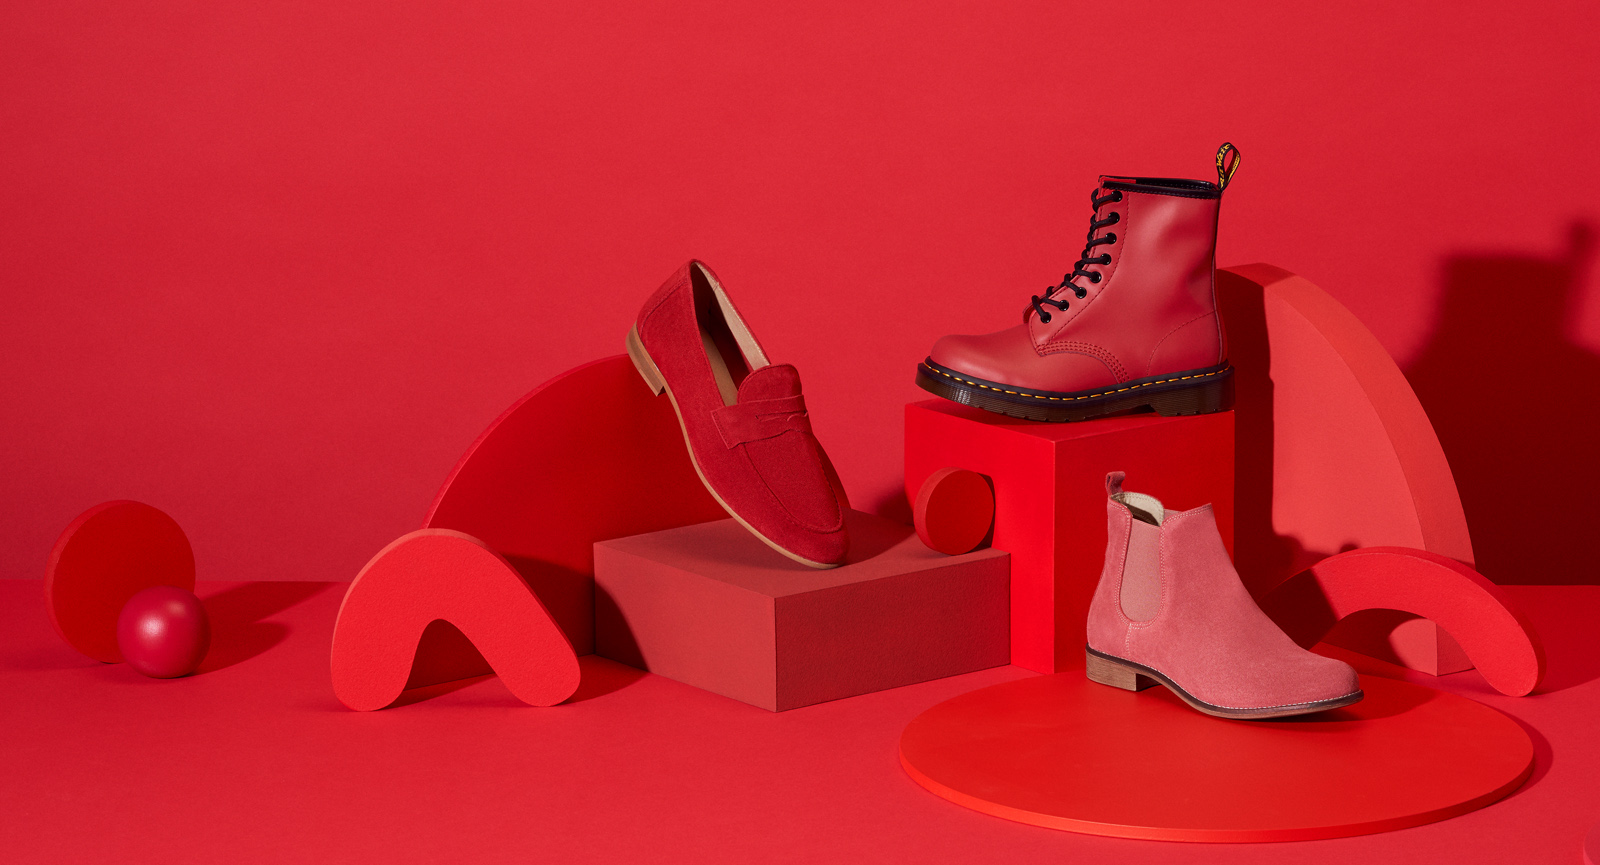 red shoes still life for Zalando Sale Campaign